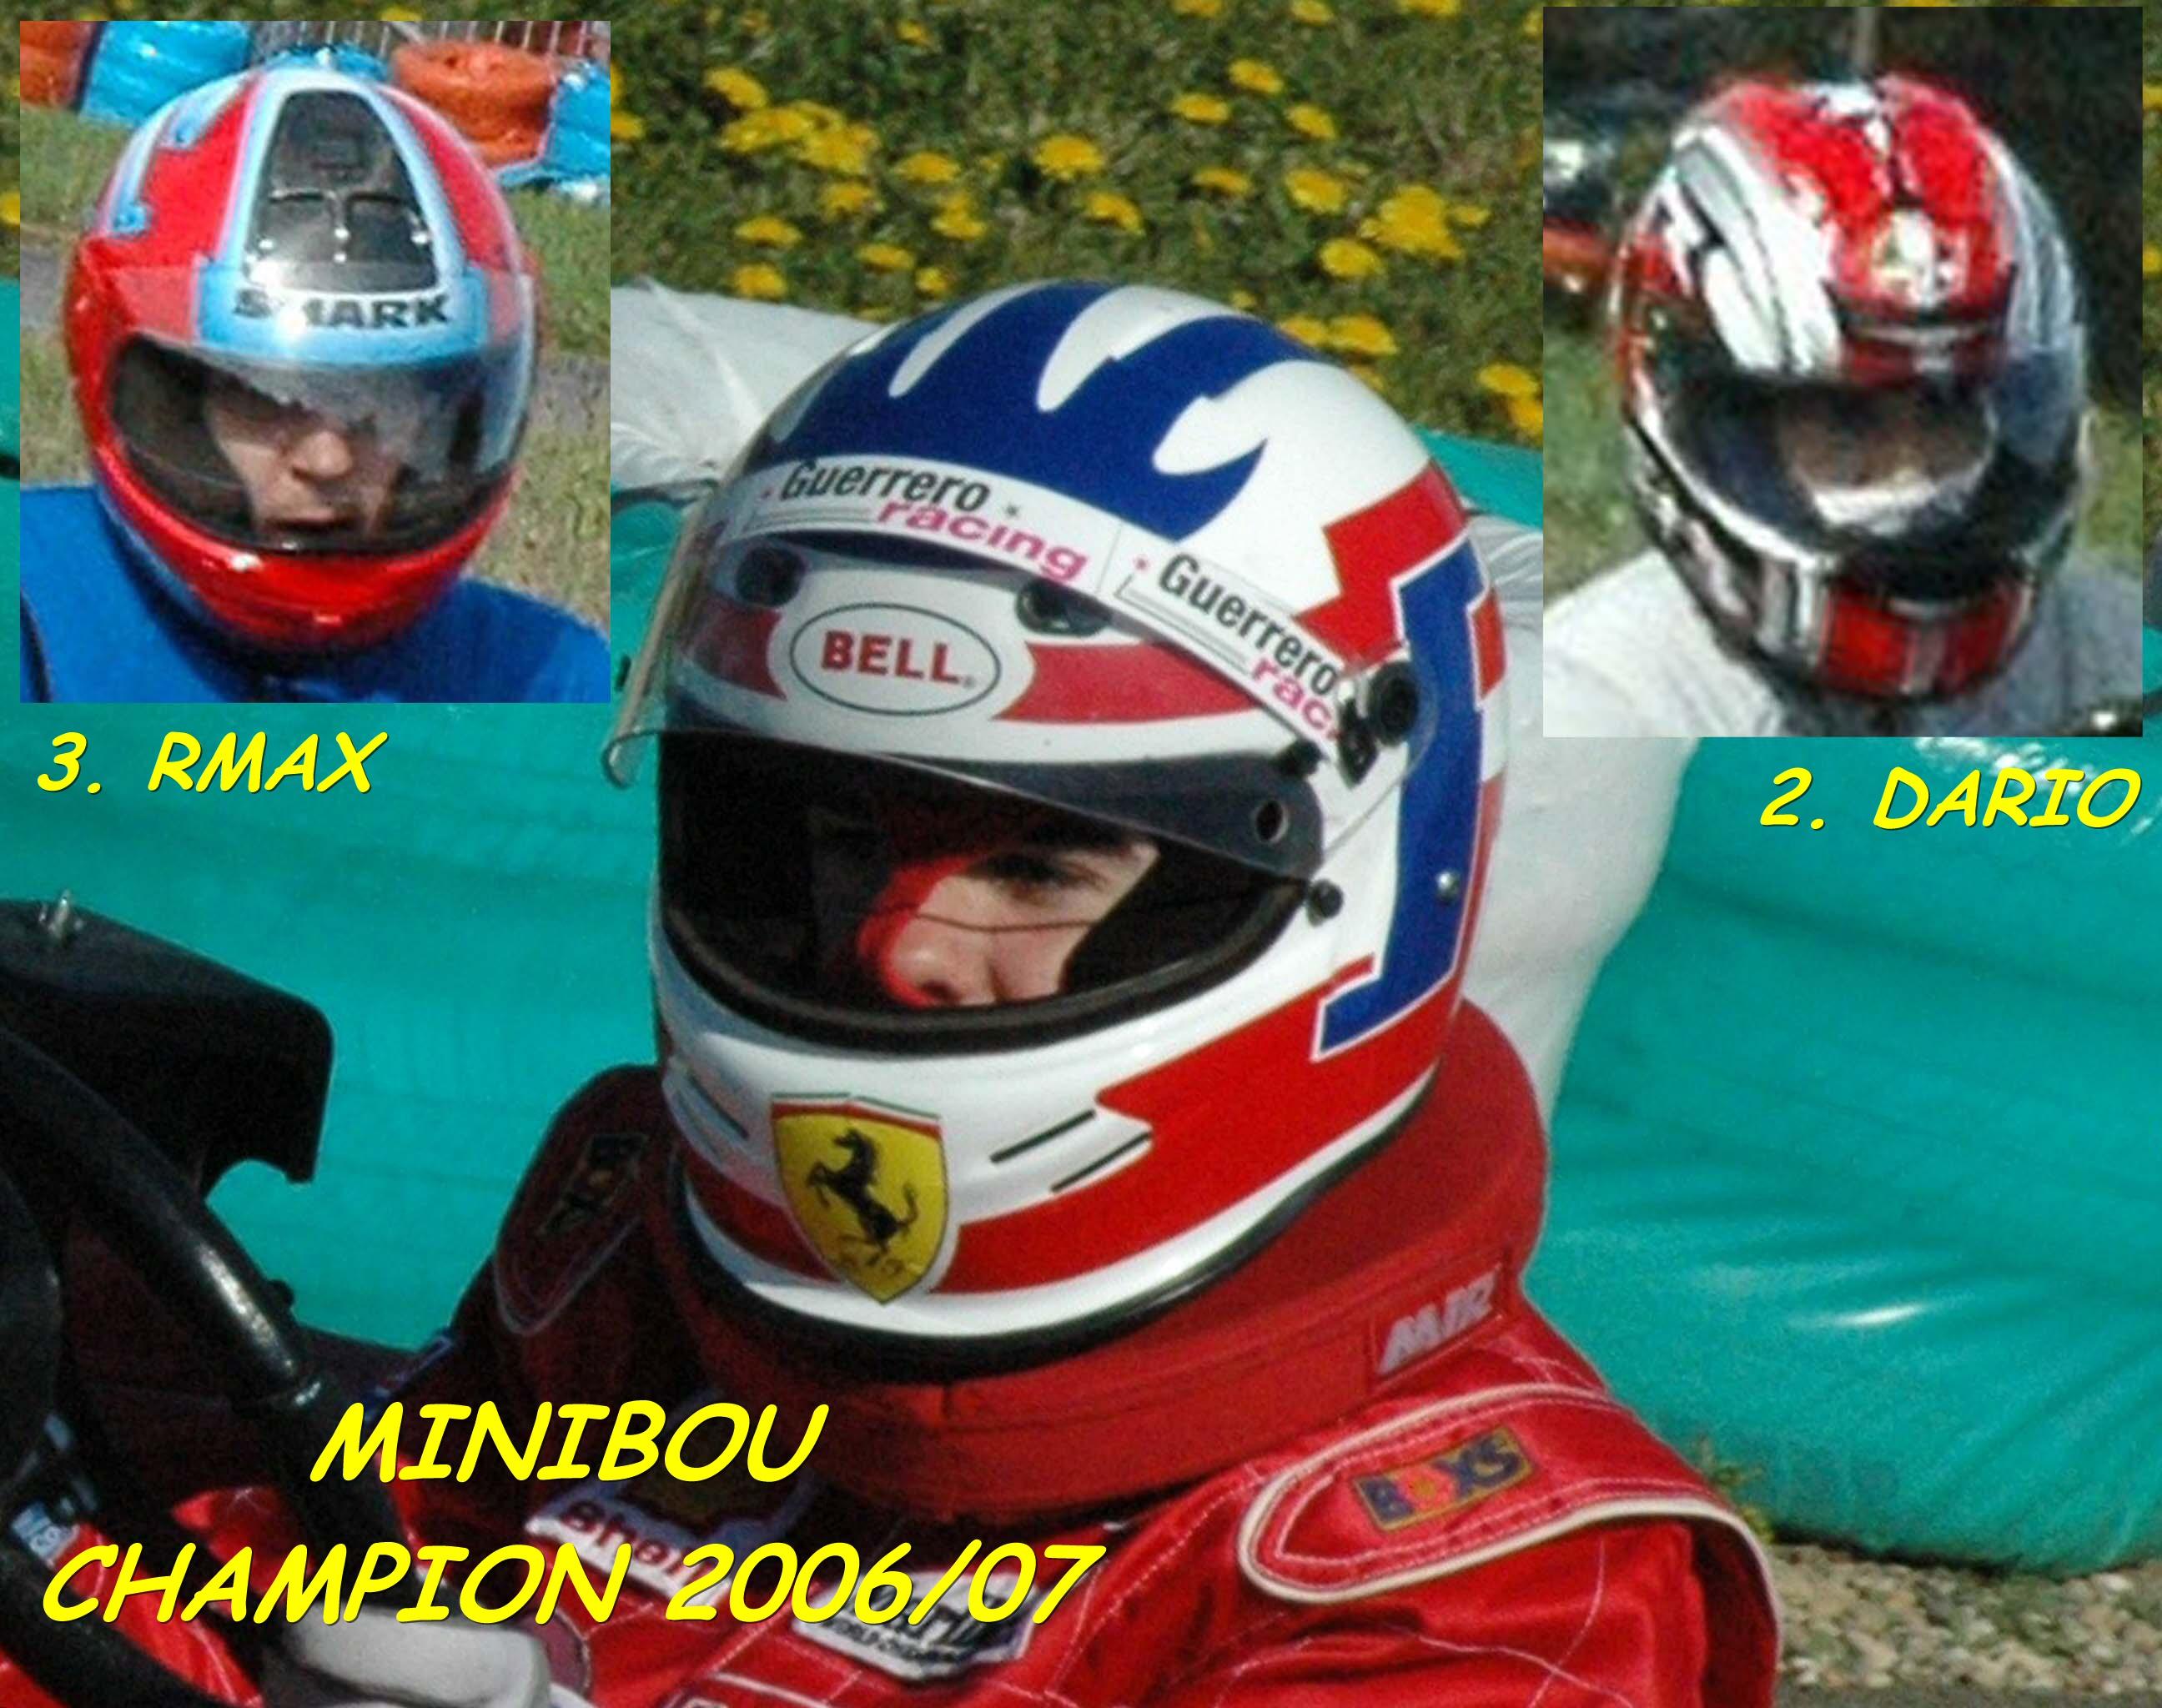 MINDARMAX CHAMP06_07 (2)